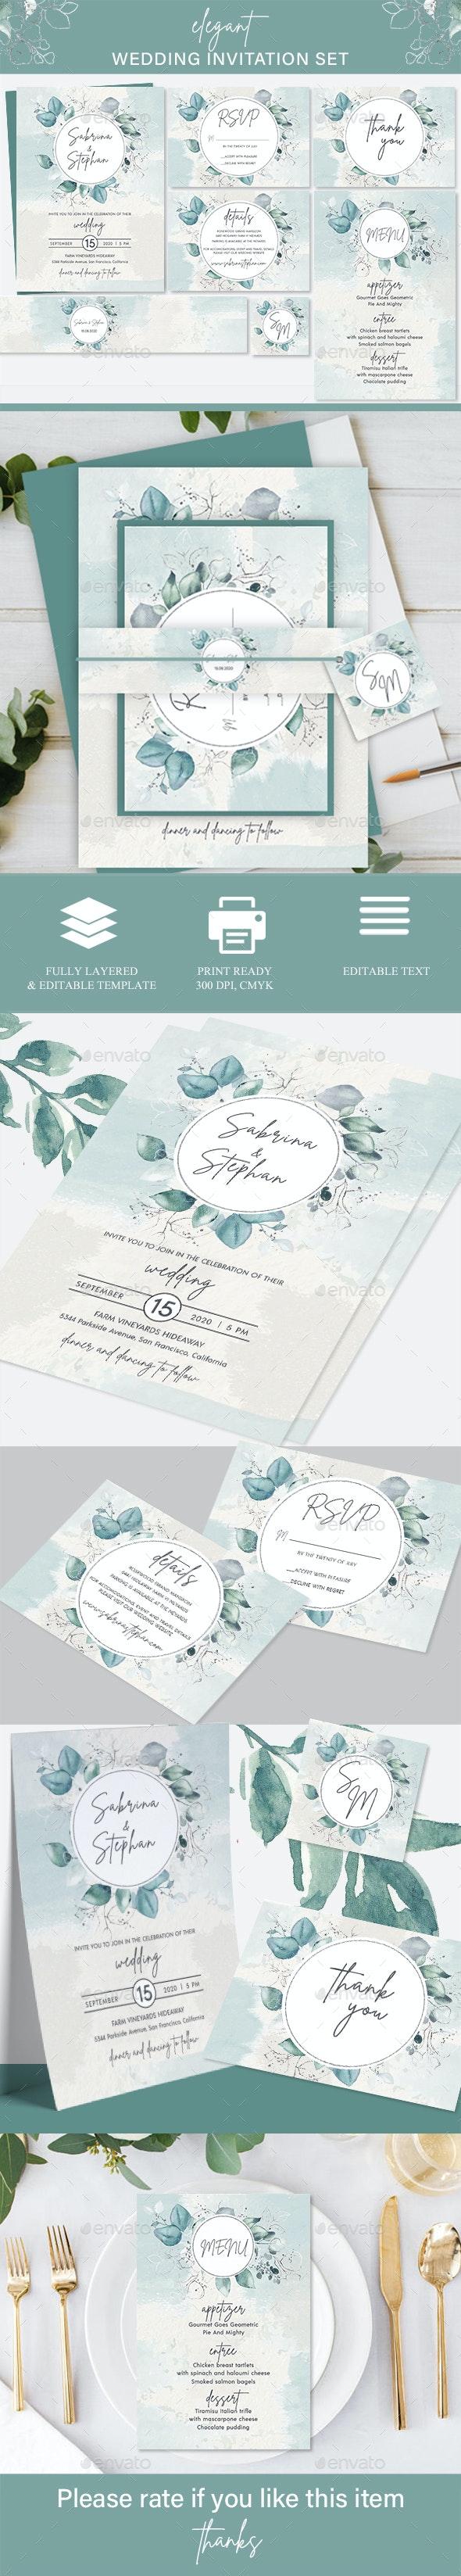 Foliage Wedding Invitation Set - Wedding Greeting Cards